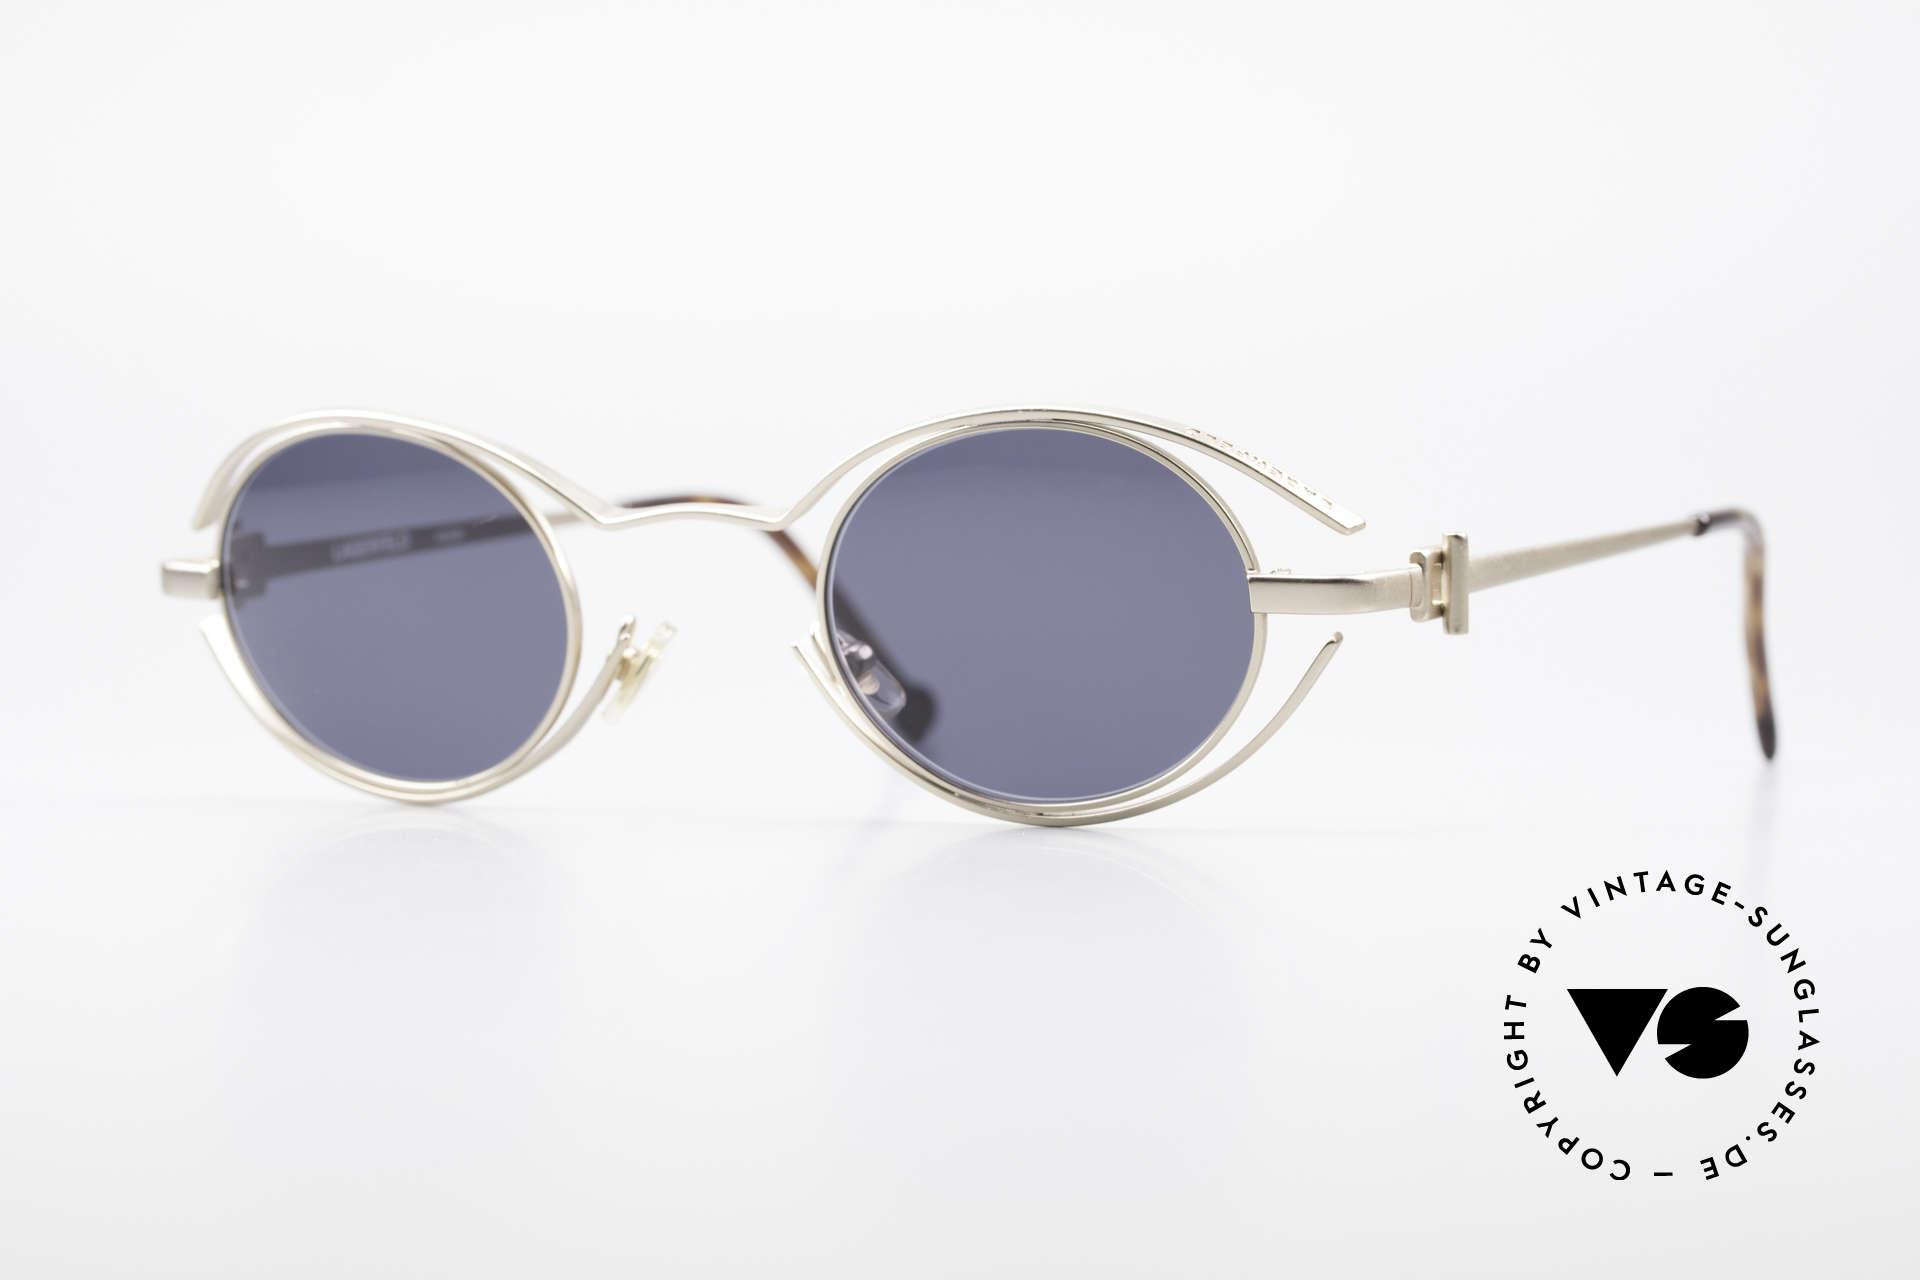 6f543bafea91 Sunglasses Karl Lagerfeld 4123 Oval 90 s Designer Shades